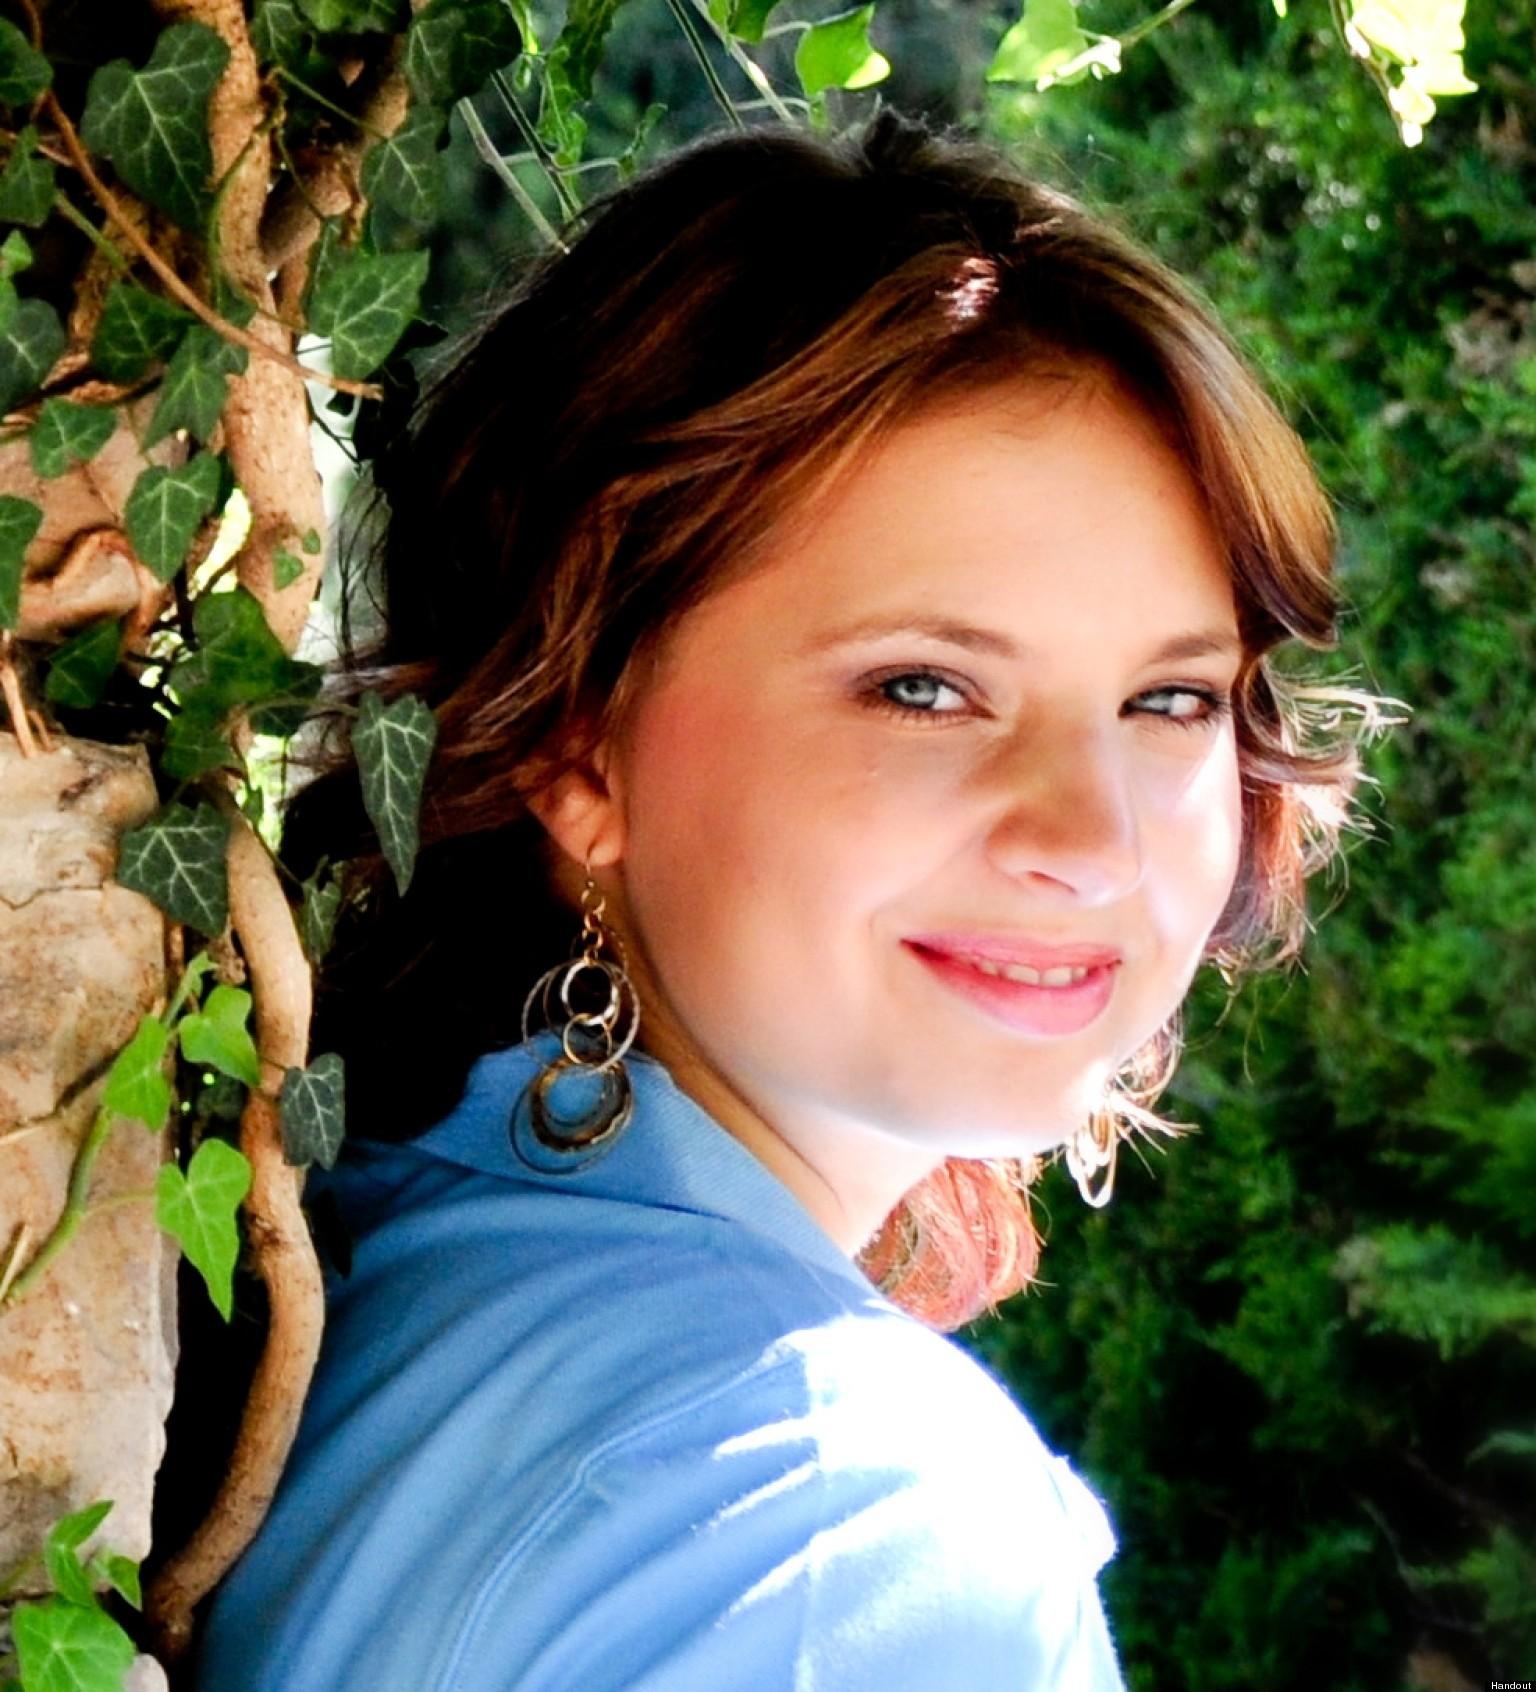 Susan Cox Powell Search Shifts To Rural Oregon Farm